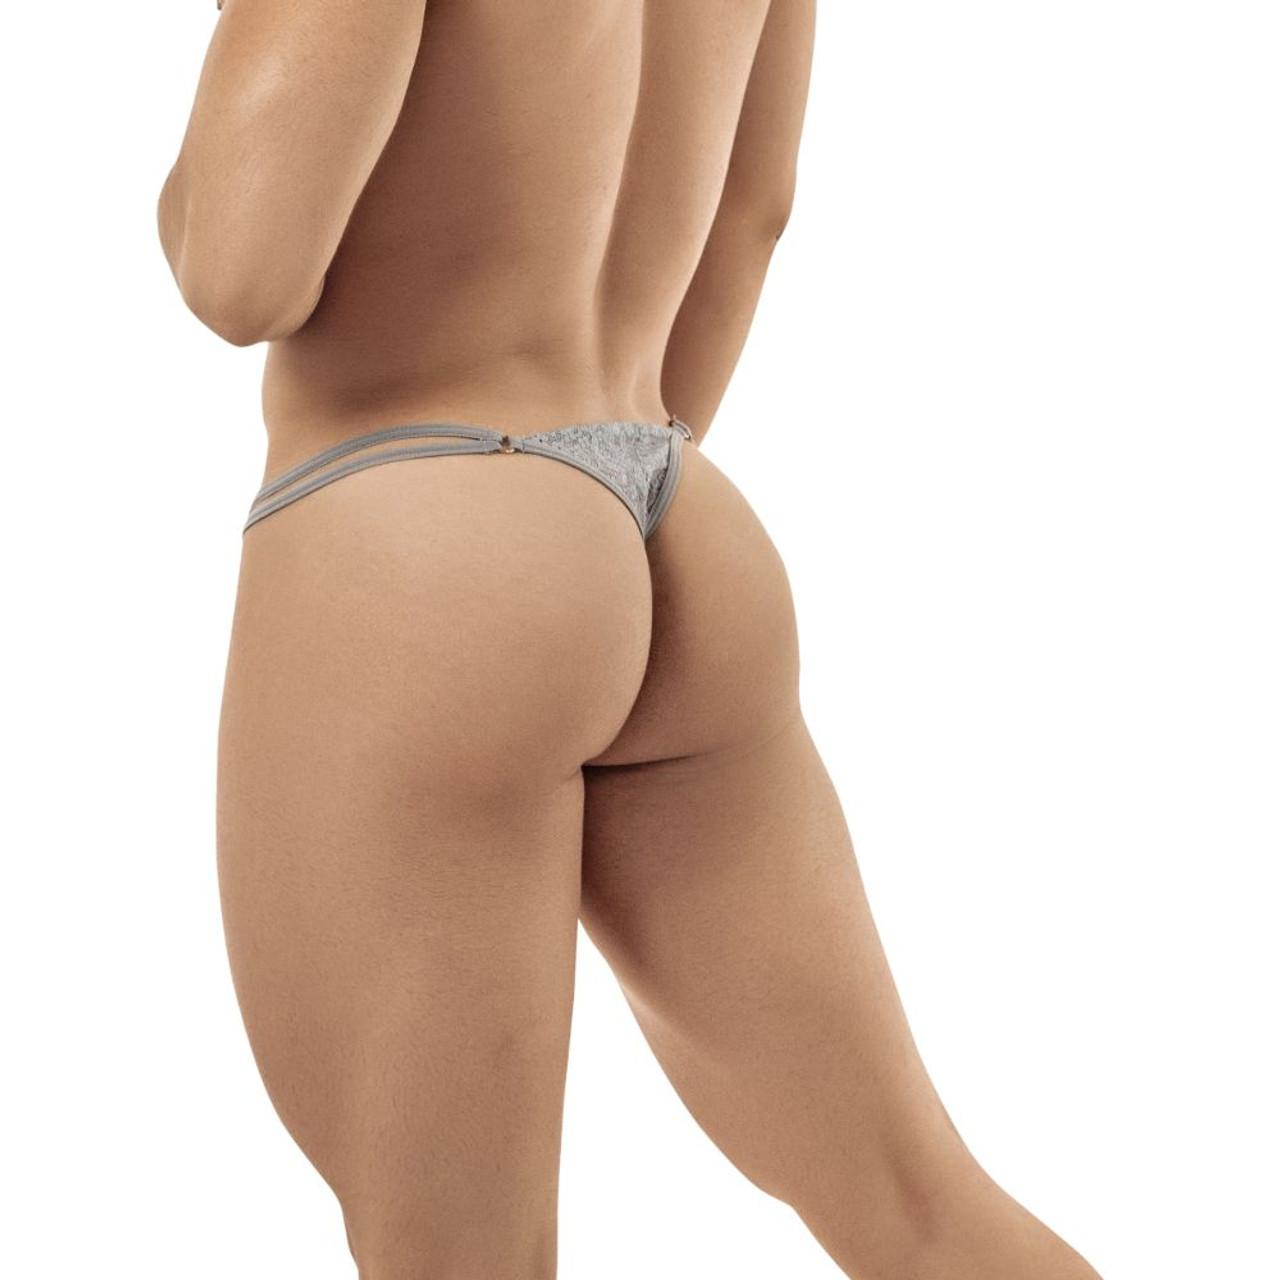 CandyMan Fashion Masculine Thongs Underwear for Men